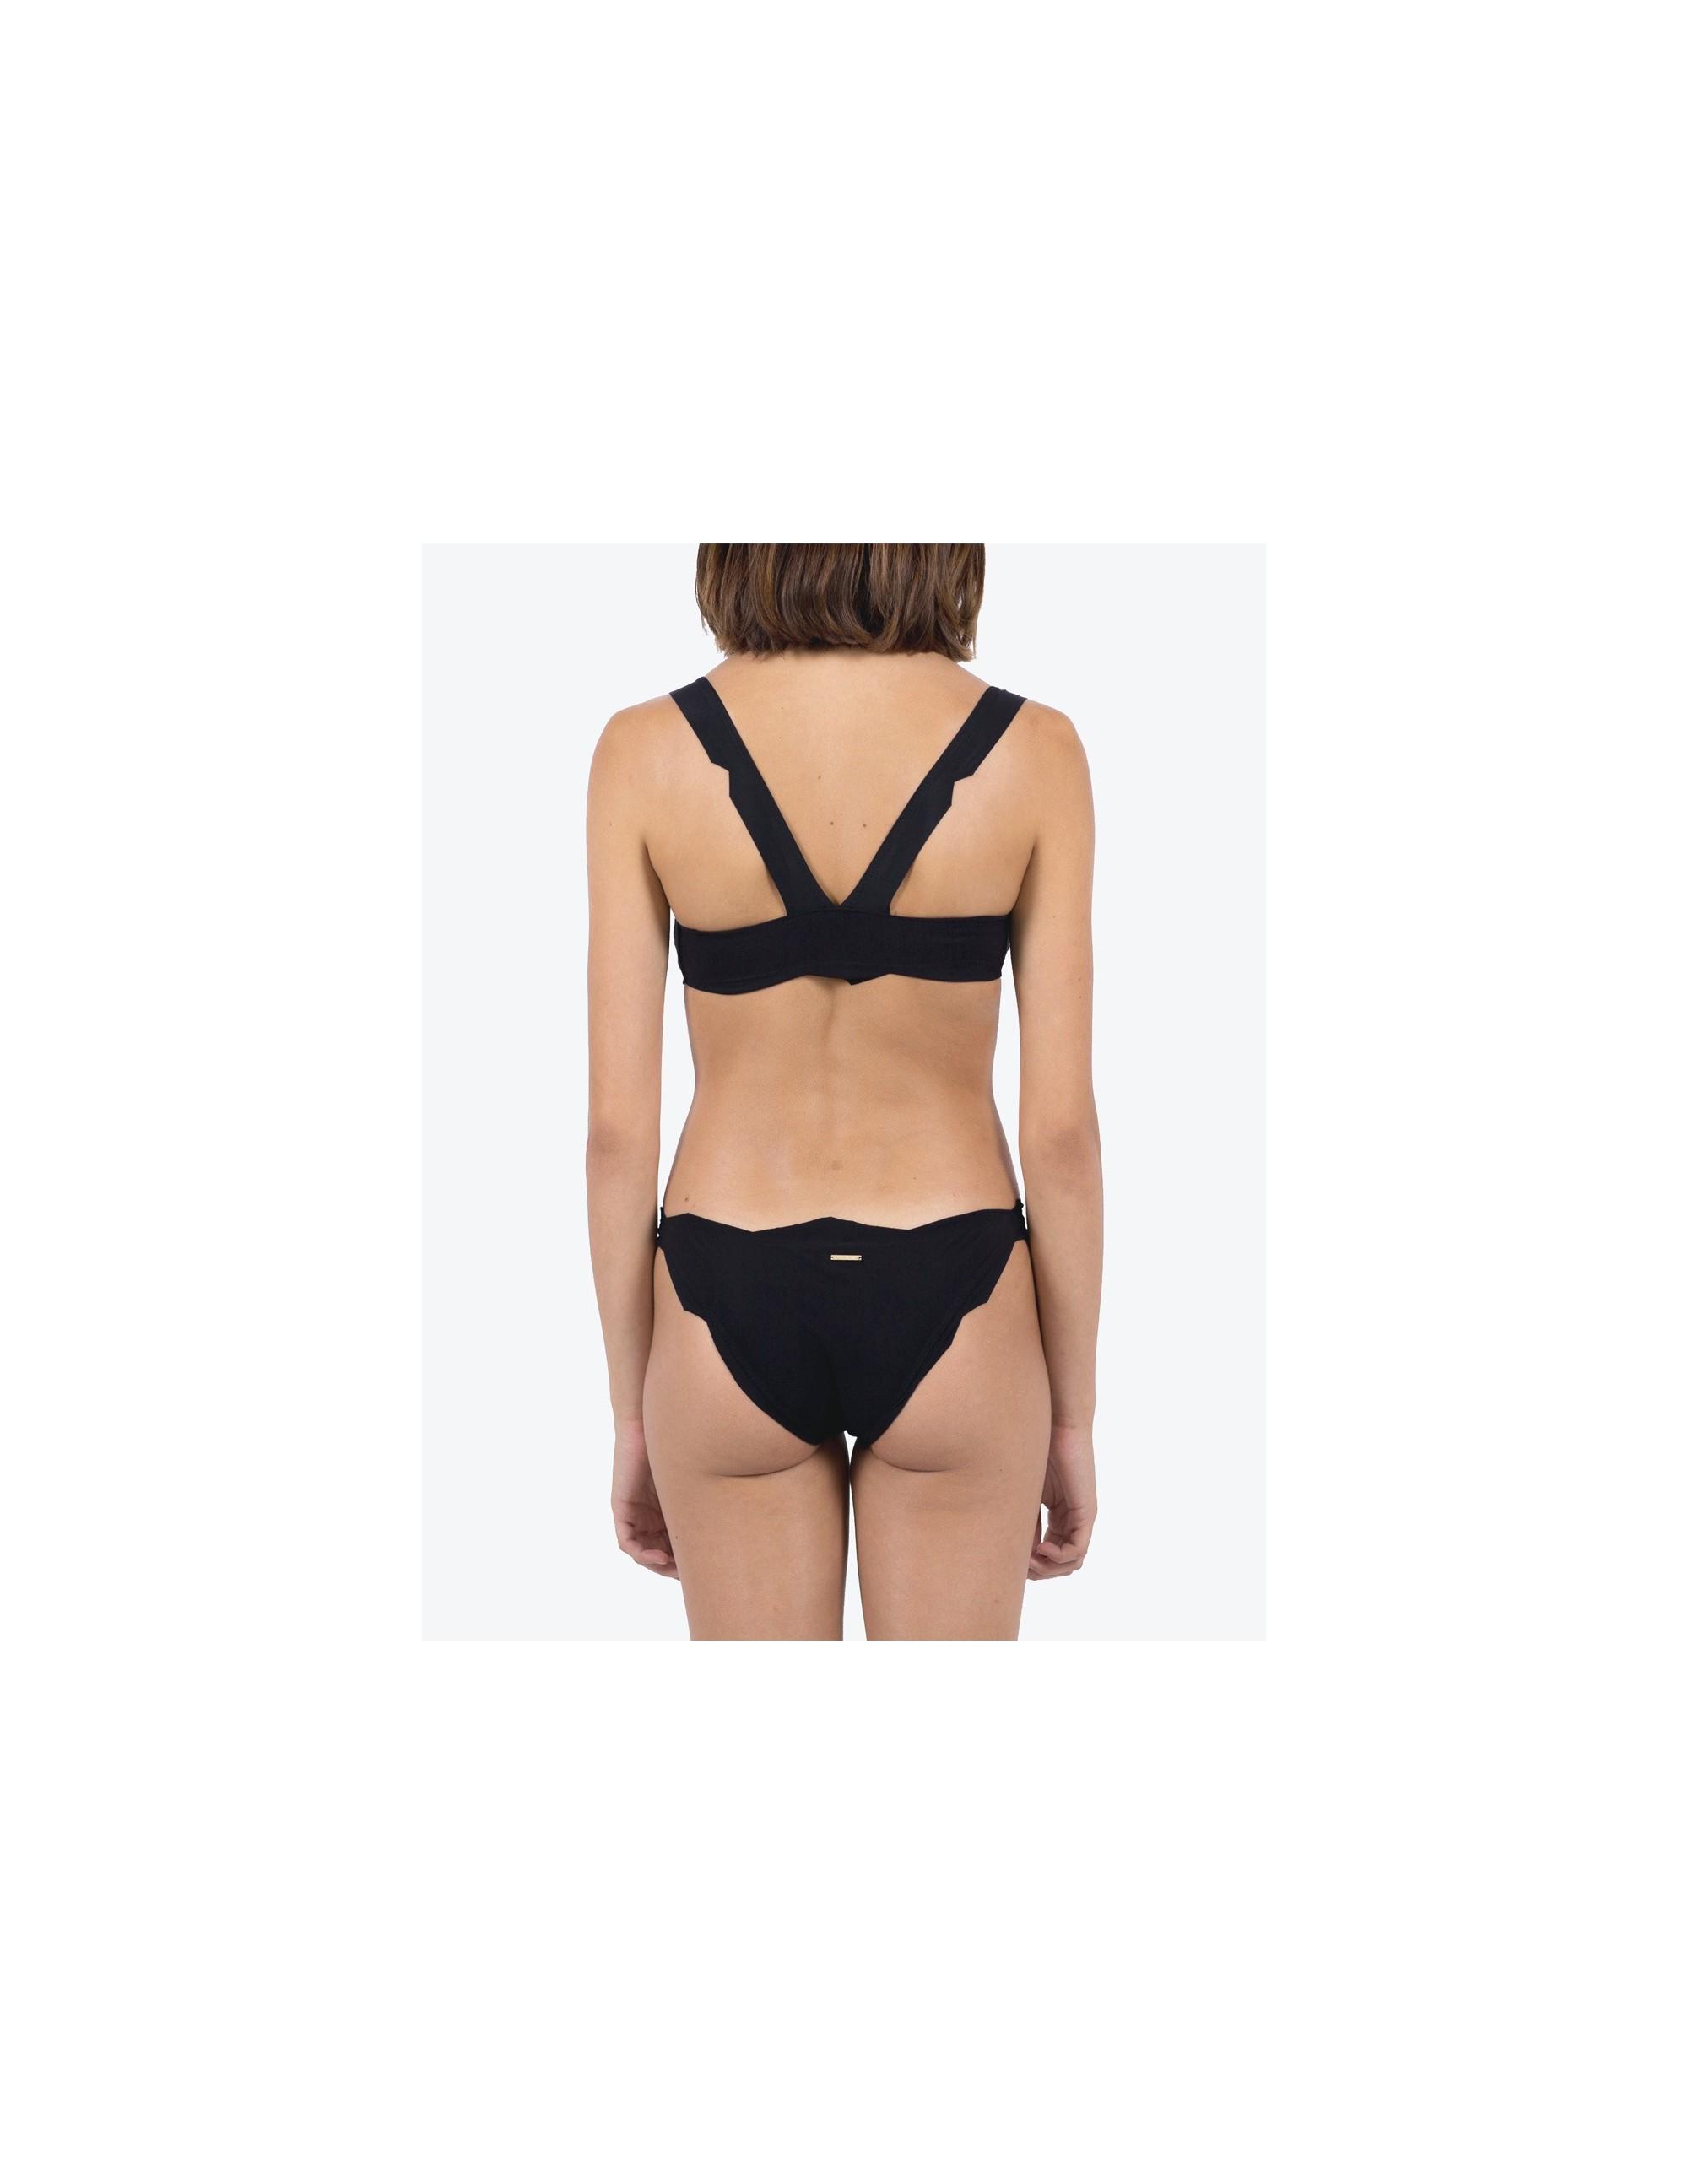 MONURIKI bikini bottom